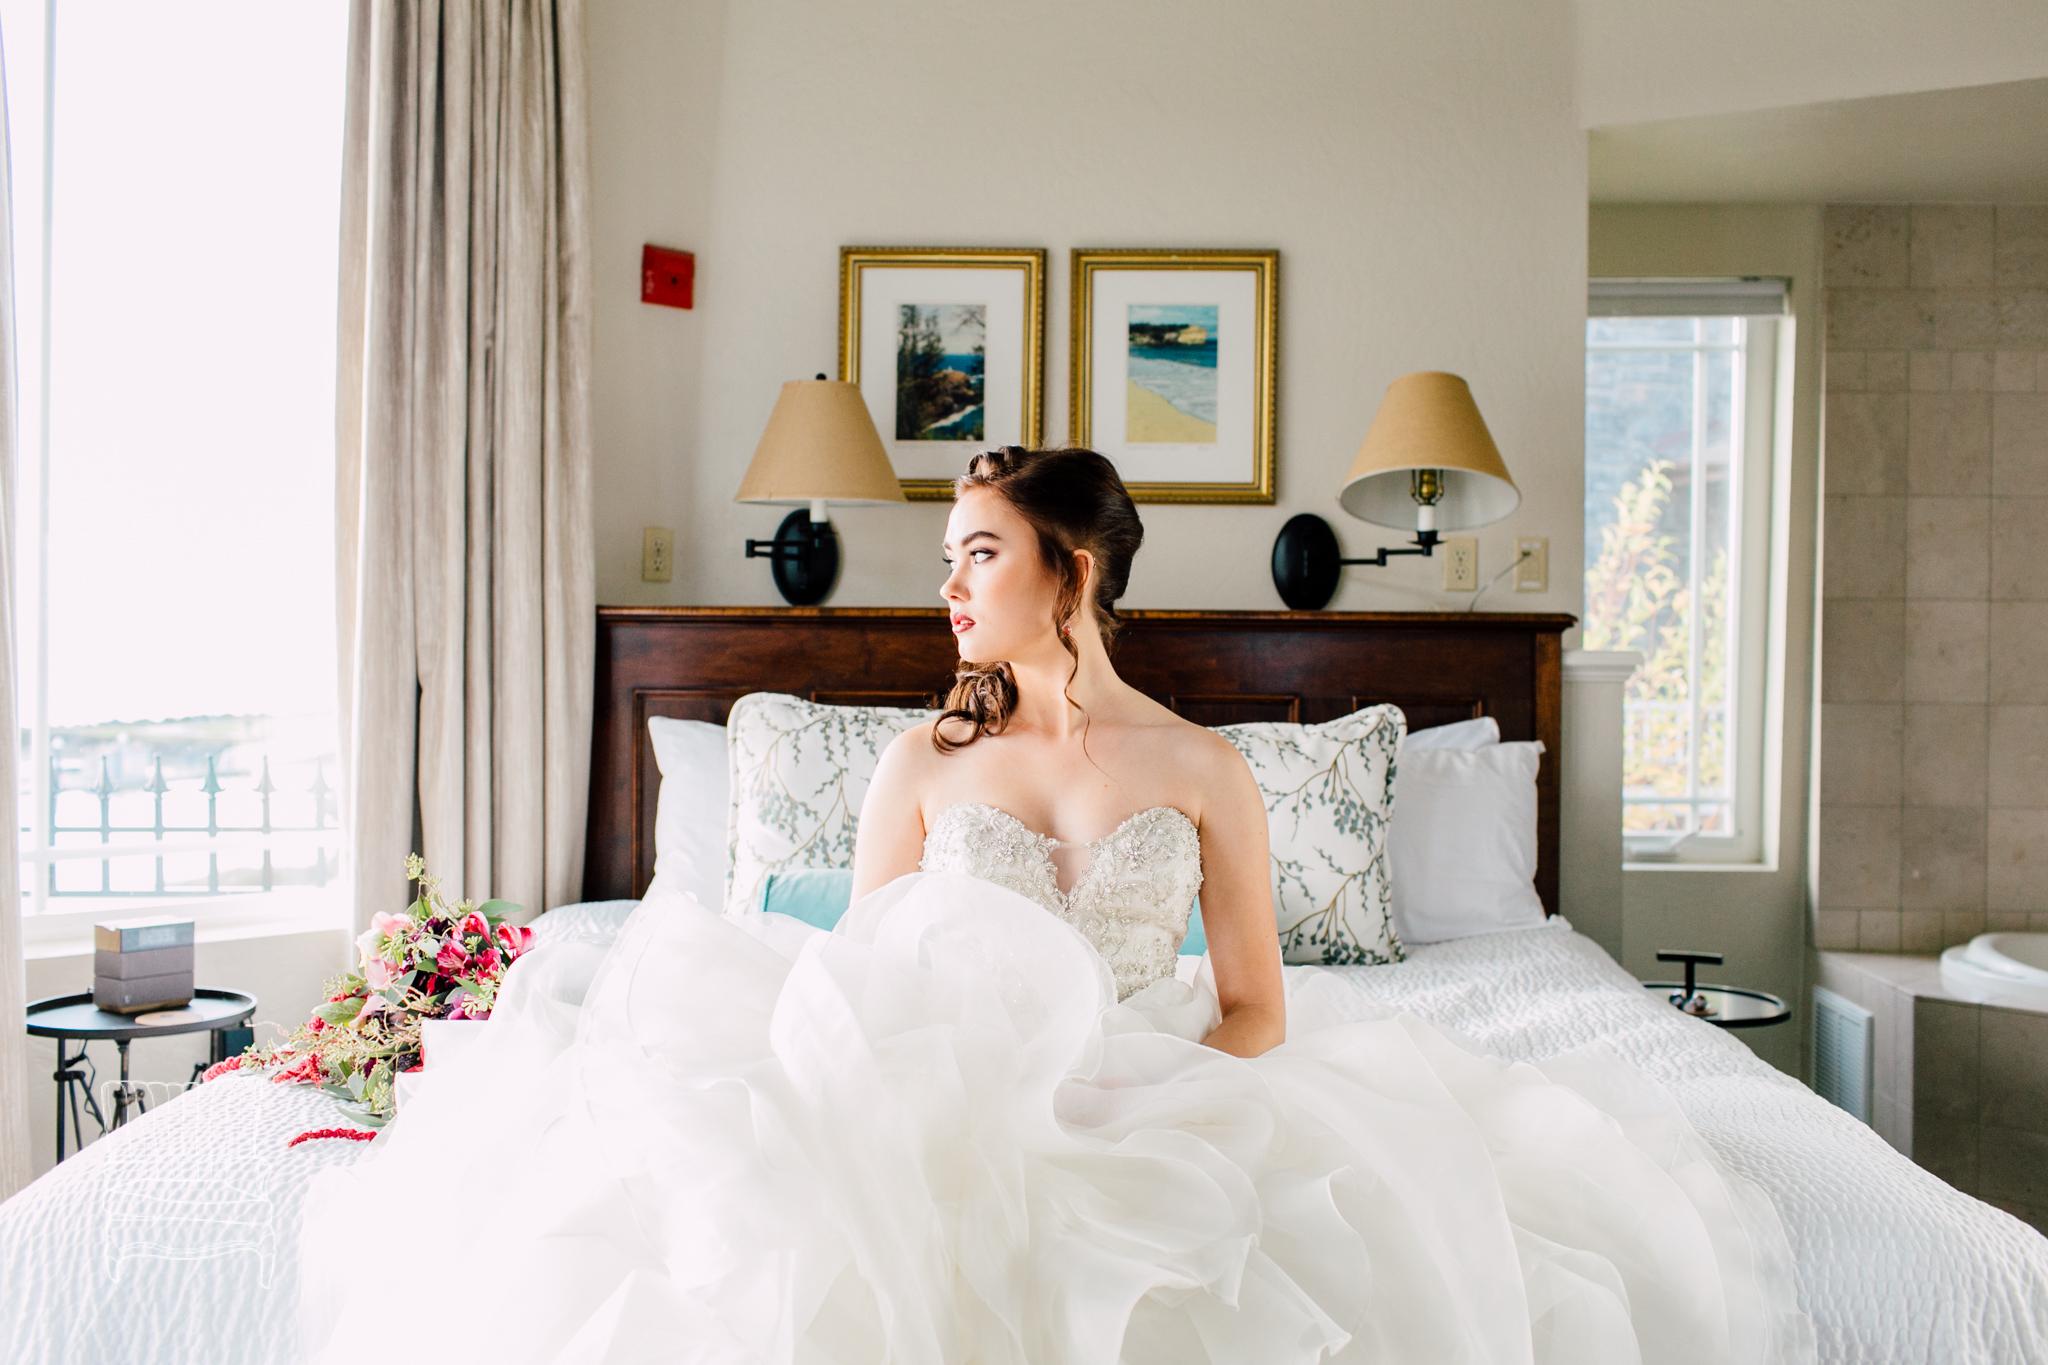 bellwether-hotel-bellingham-wedding-photographer-katheryn-moran-glitz-glam-styled-367.jpg